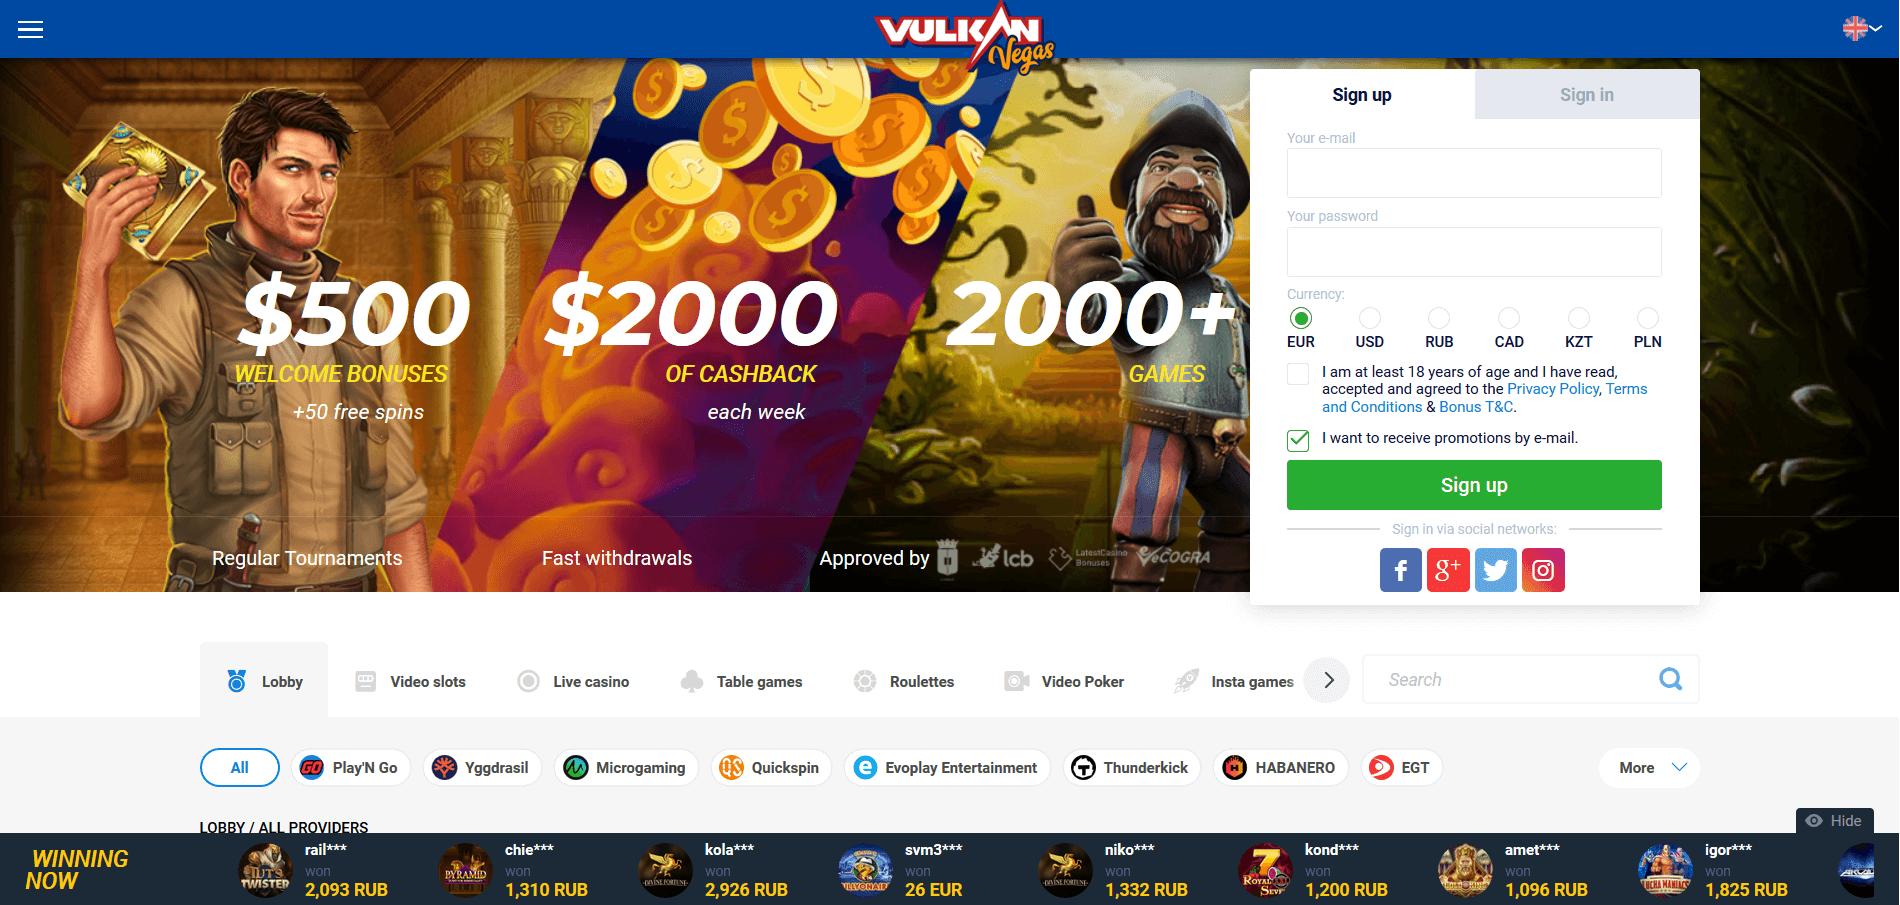 vulkan vegas screenshot